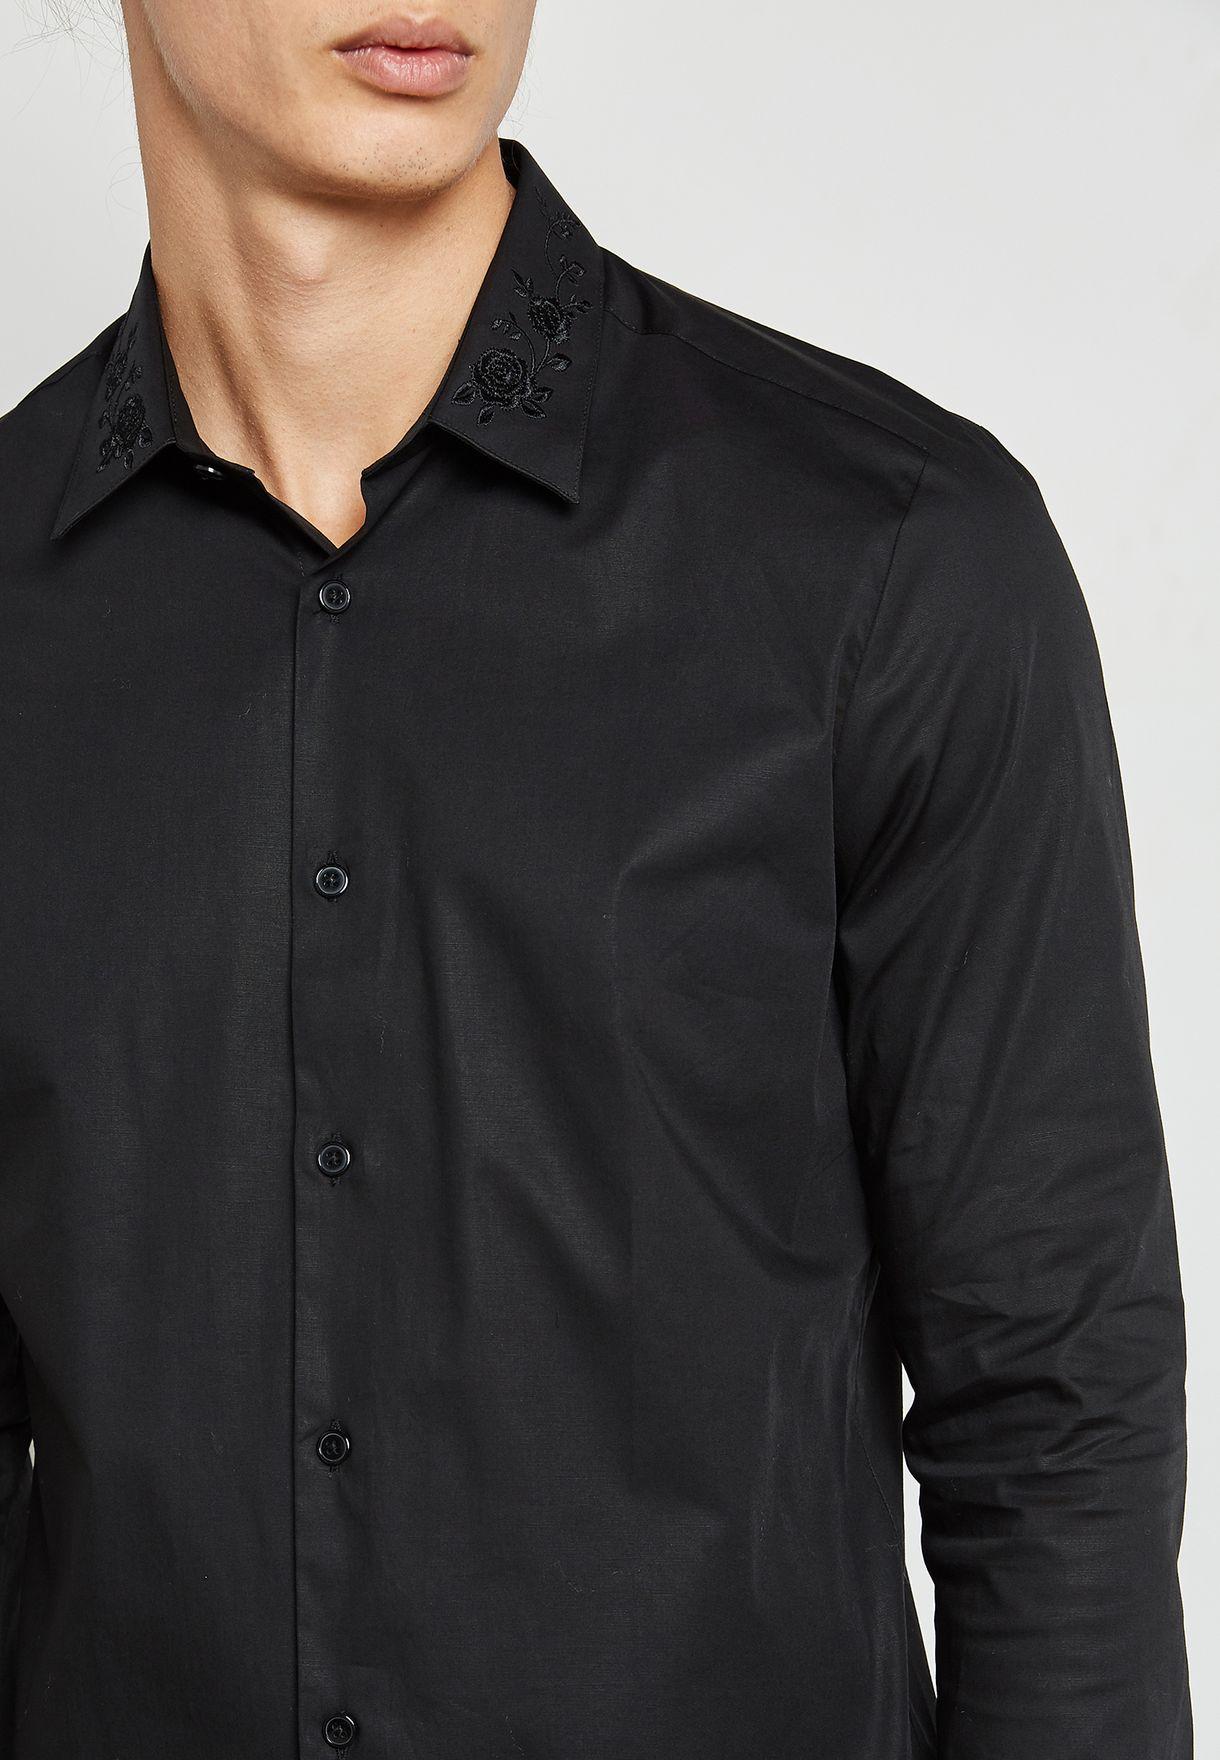 Shop Burton Black Embroidered Collar Shirt 22d01lblk For Men In